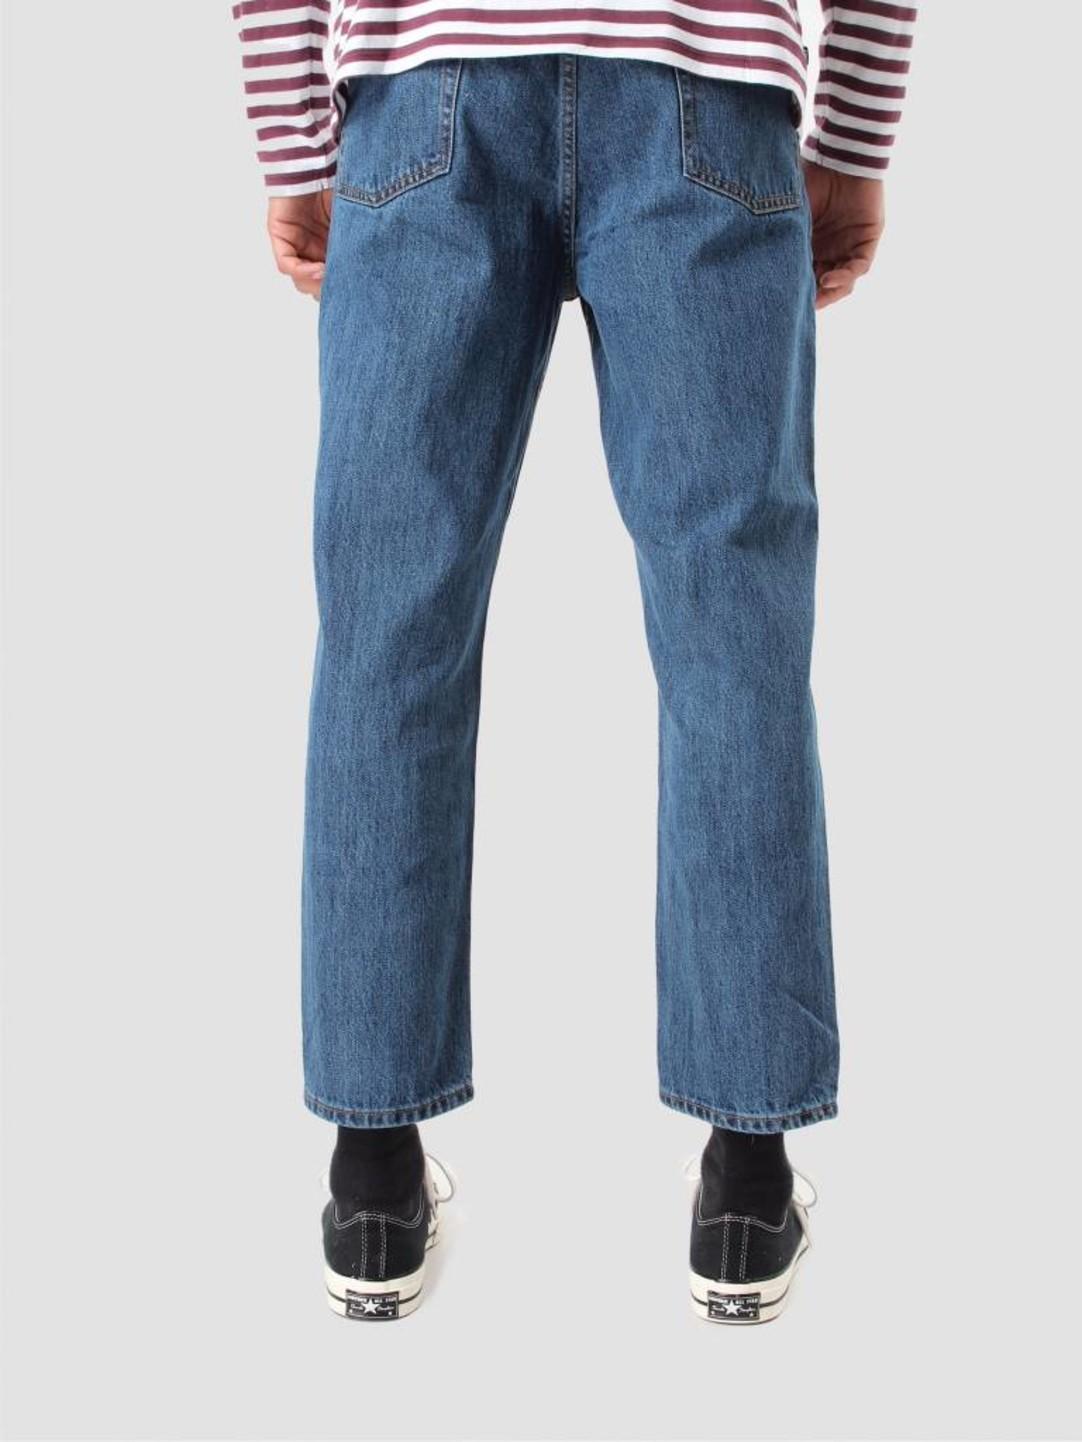 Obey Obey Bender 90's Denim Pants Stone Wash Indigo 142010050 Stn